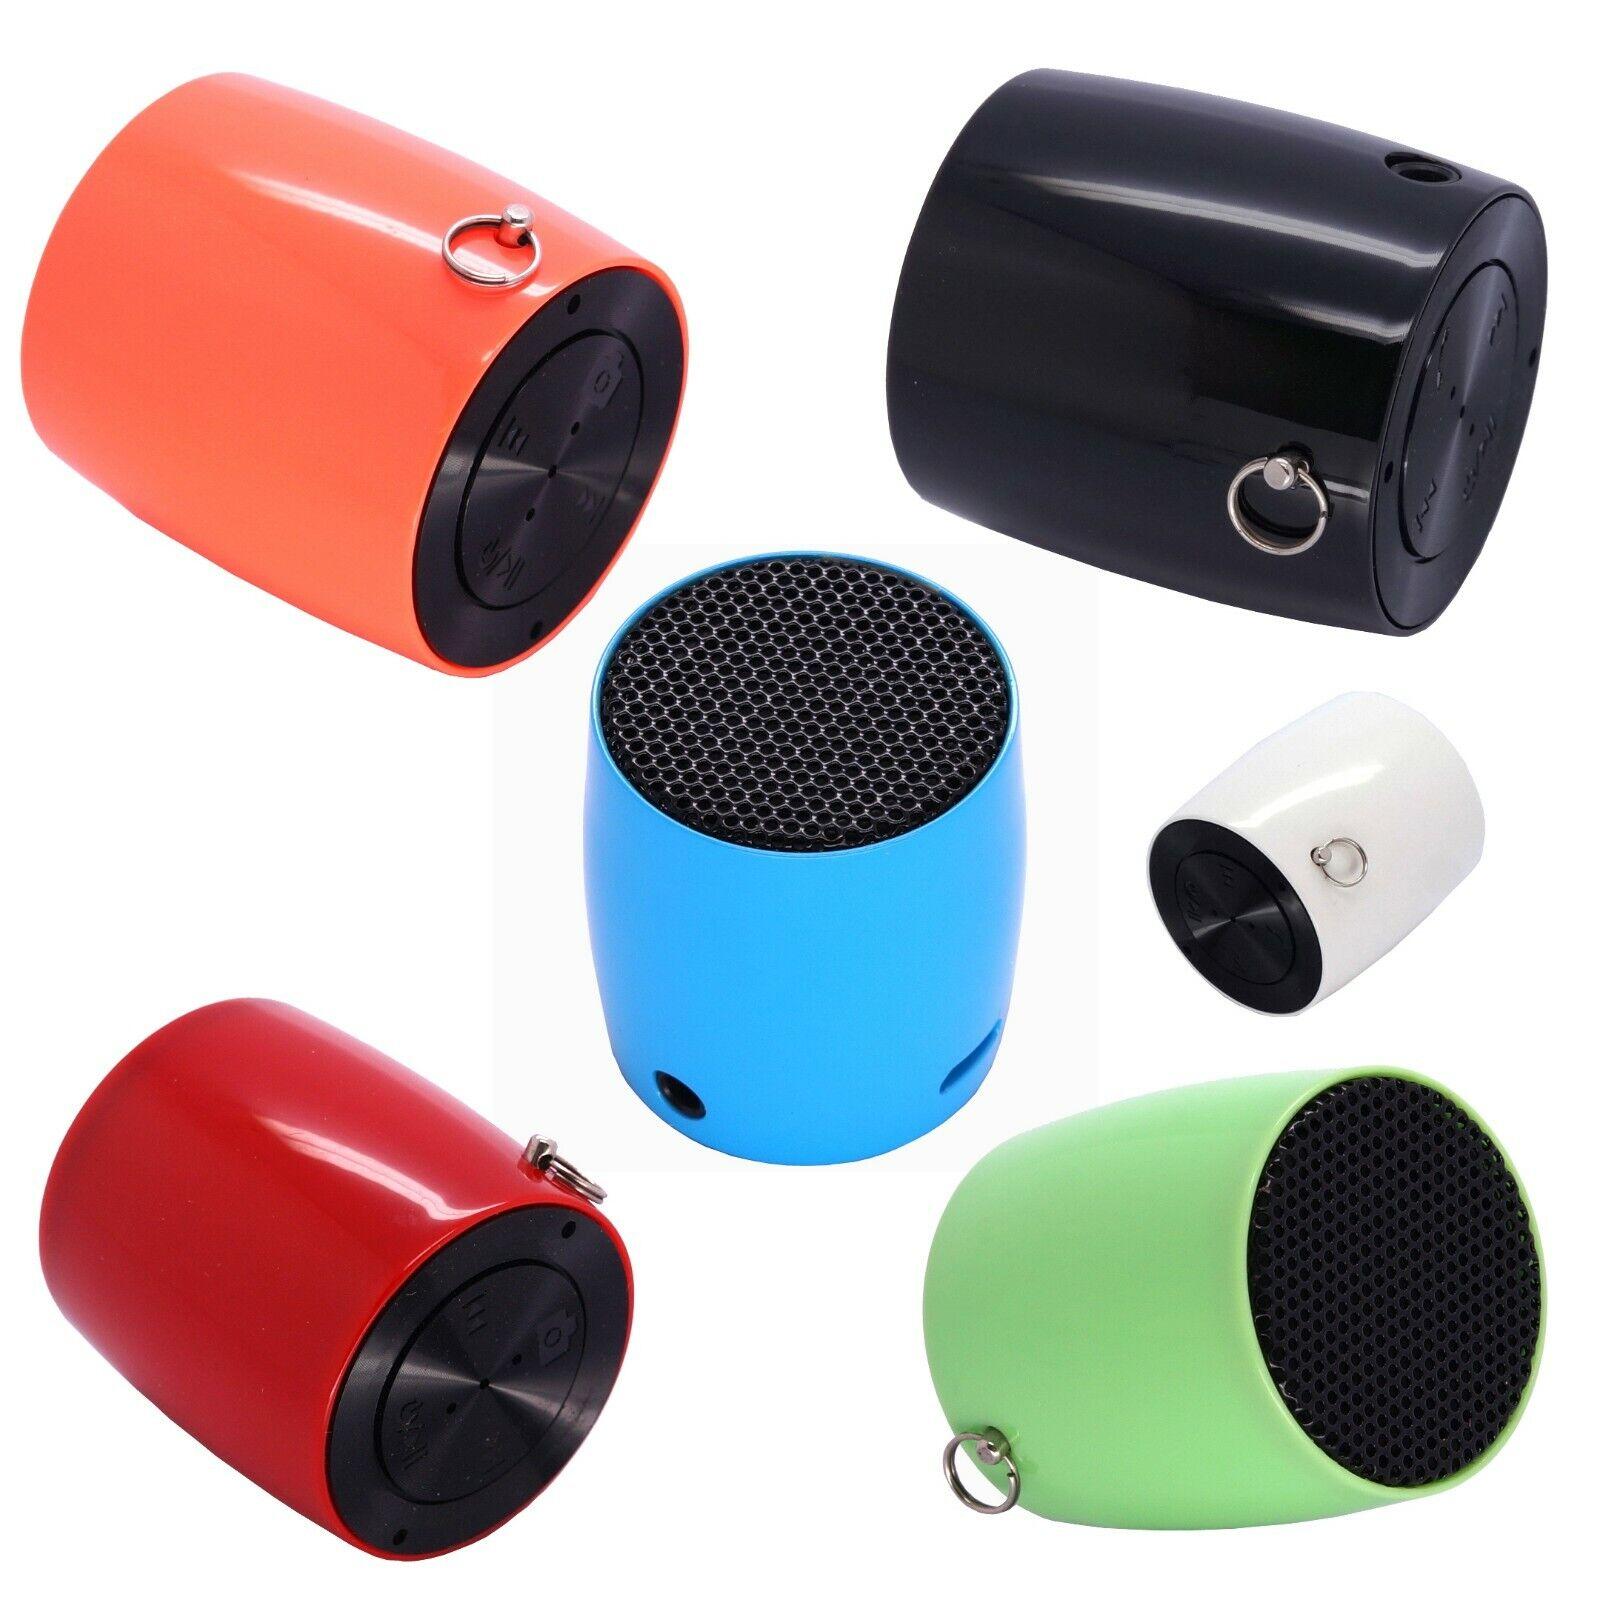 Mini Drum Bluetooth Speaker with Selfie Camera feature